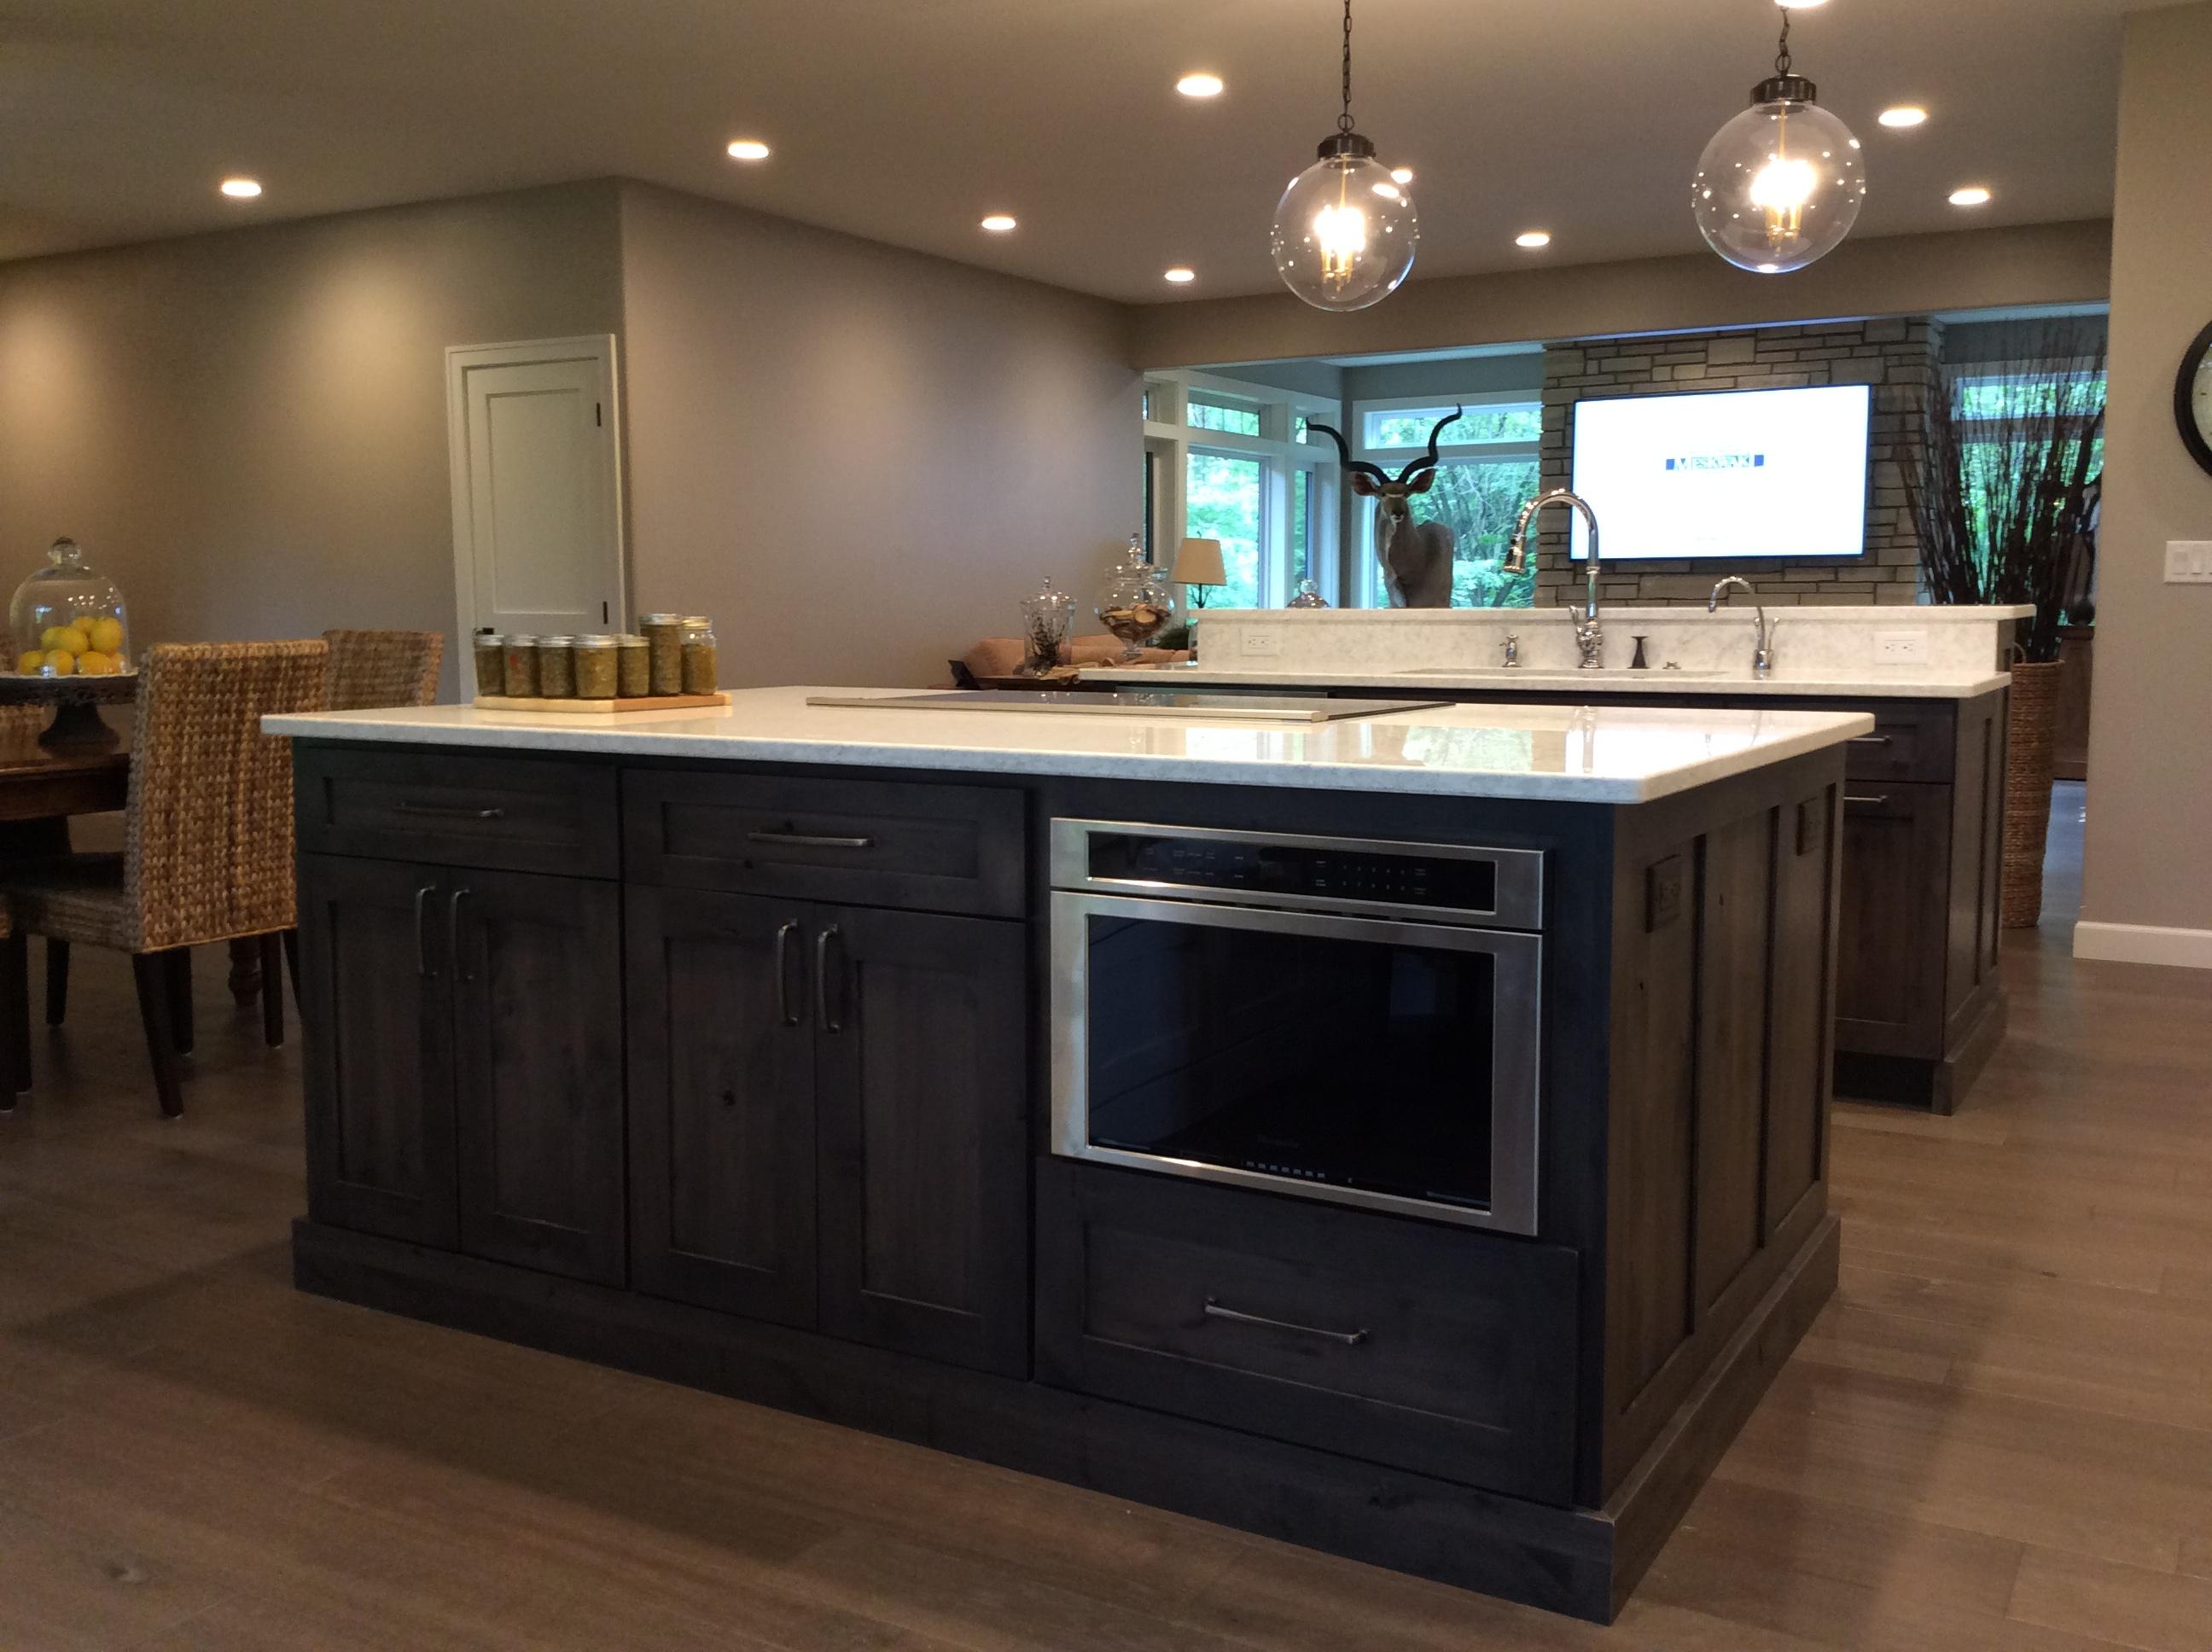 Award Winning Kitchen Remodel Cabinet Style Coralville